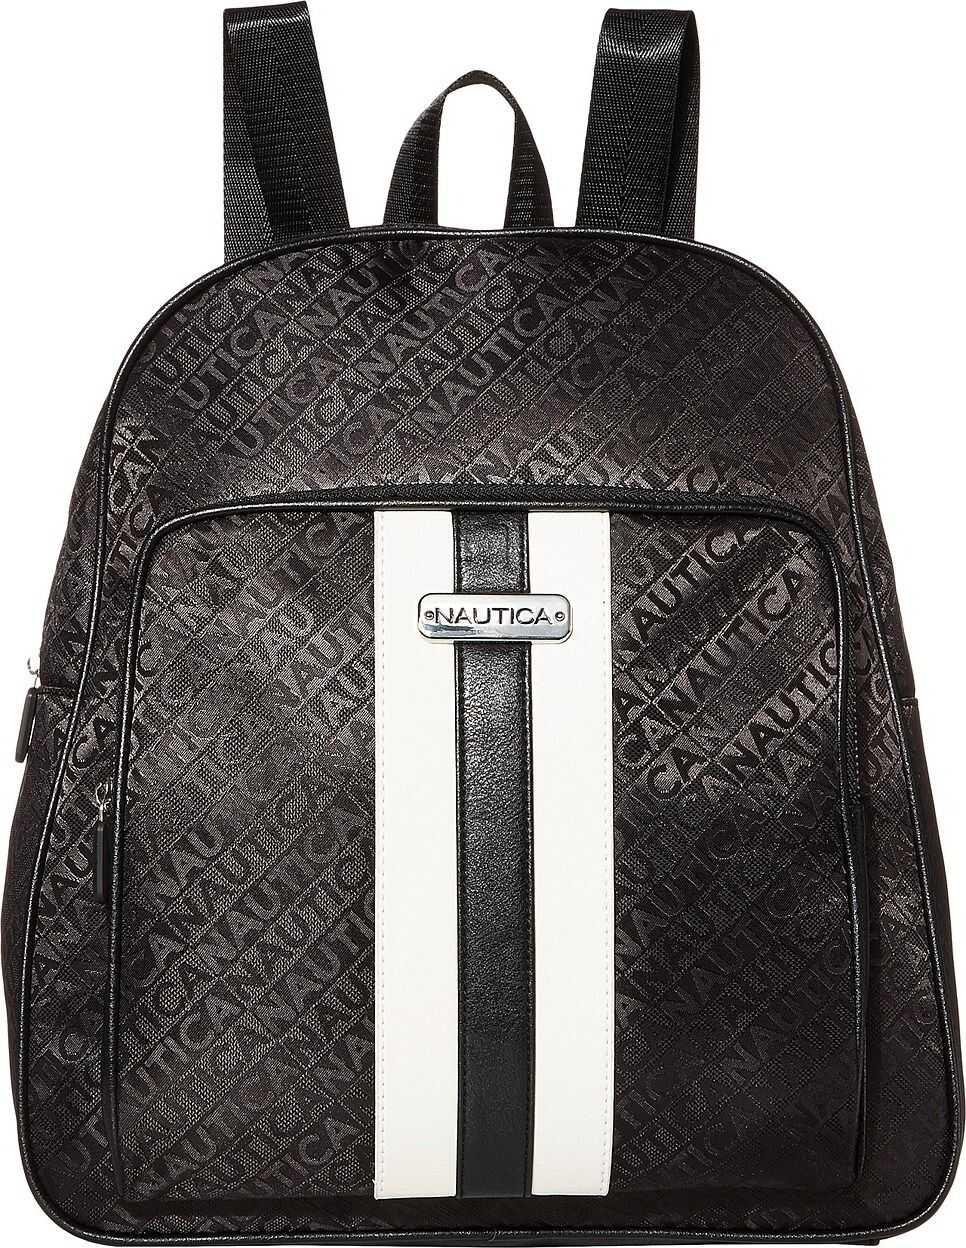 Nautica Lakeside Backpack Black